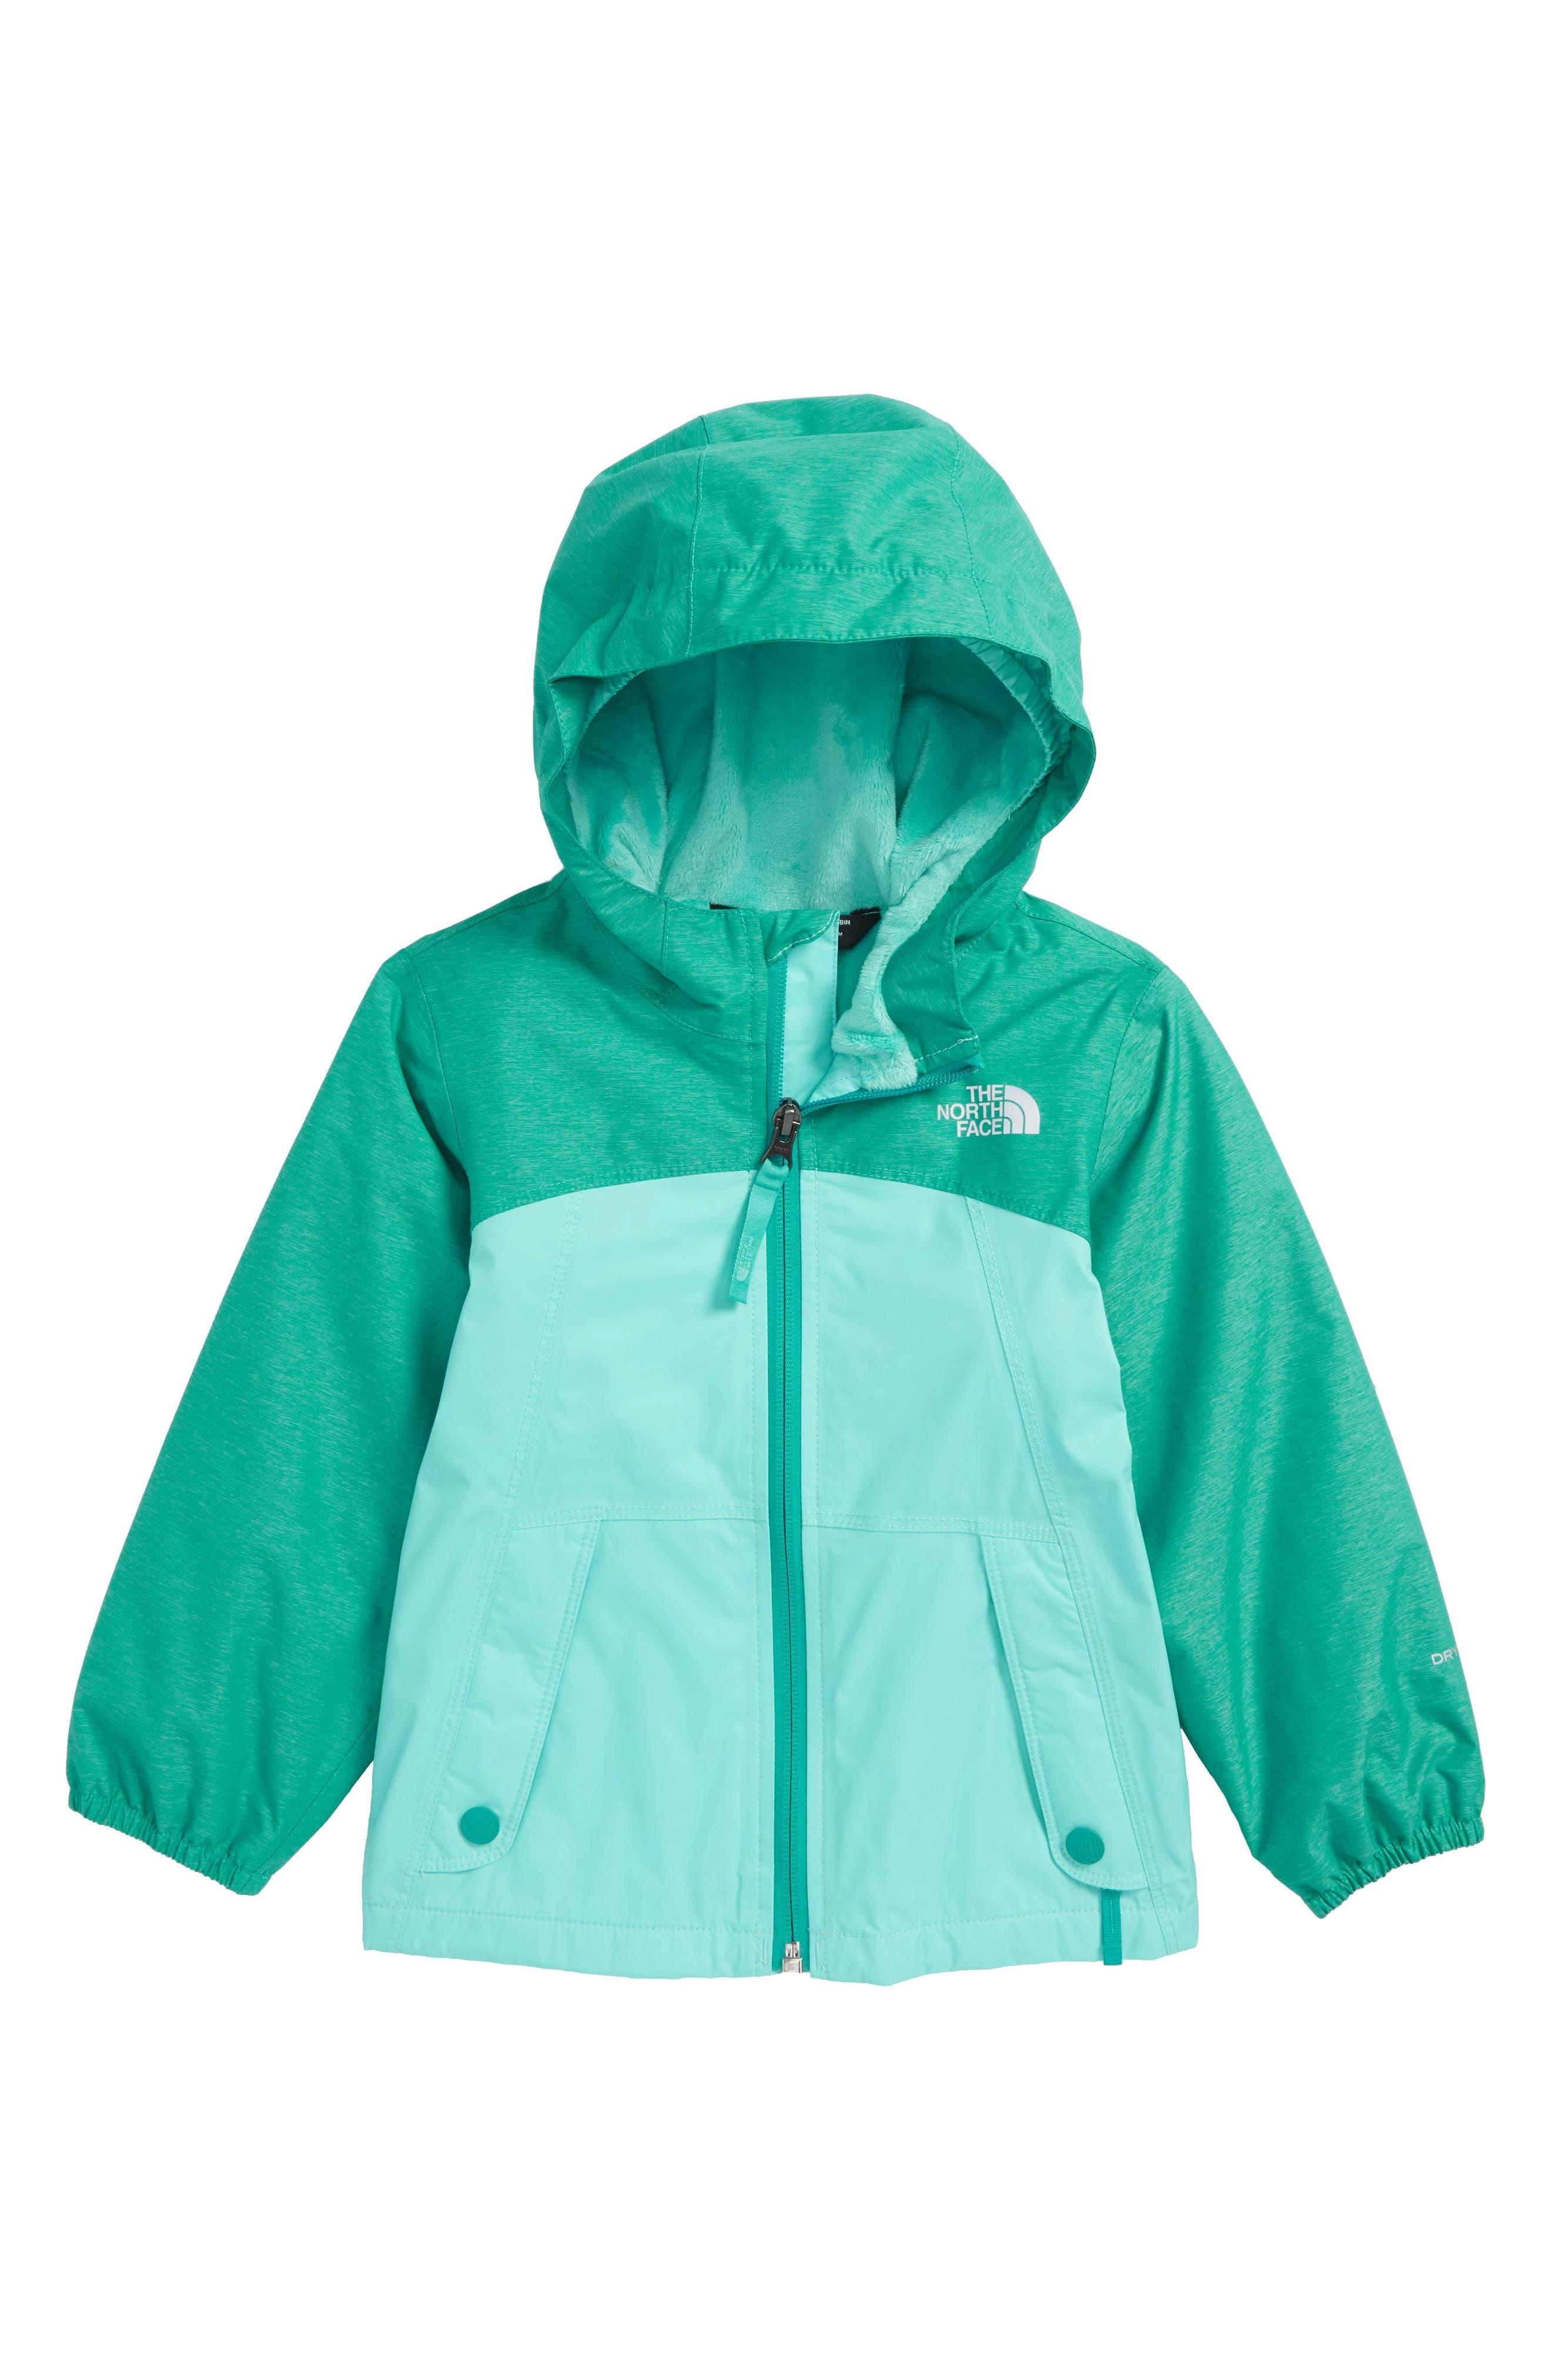 Warm Storm Jacket,                         Main,                         color, KOKOMO GREEN HEATHER